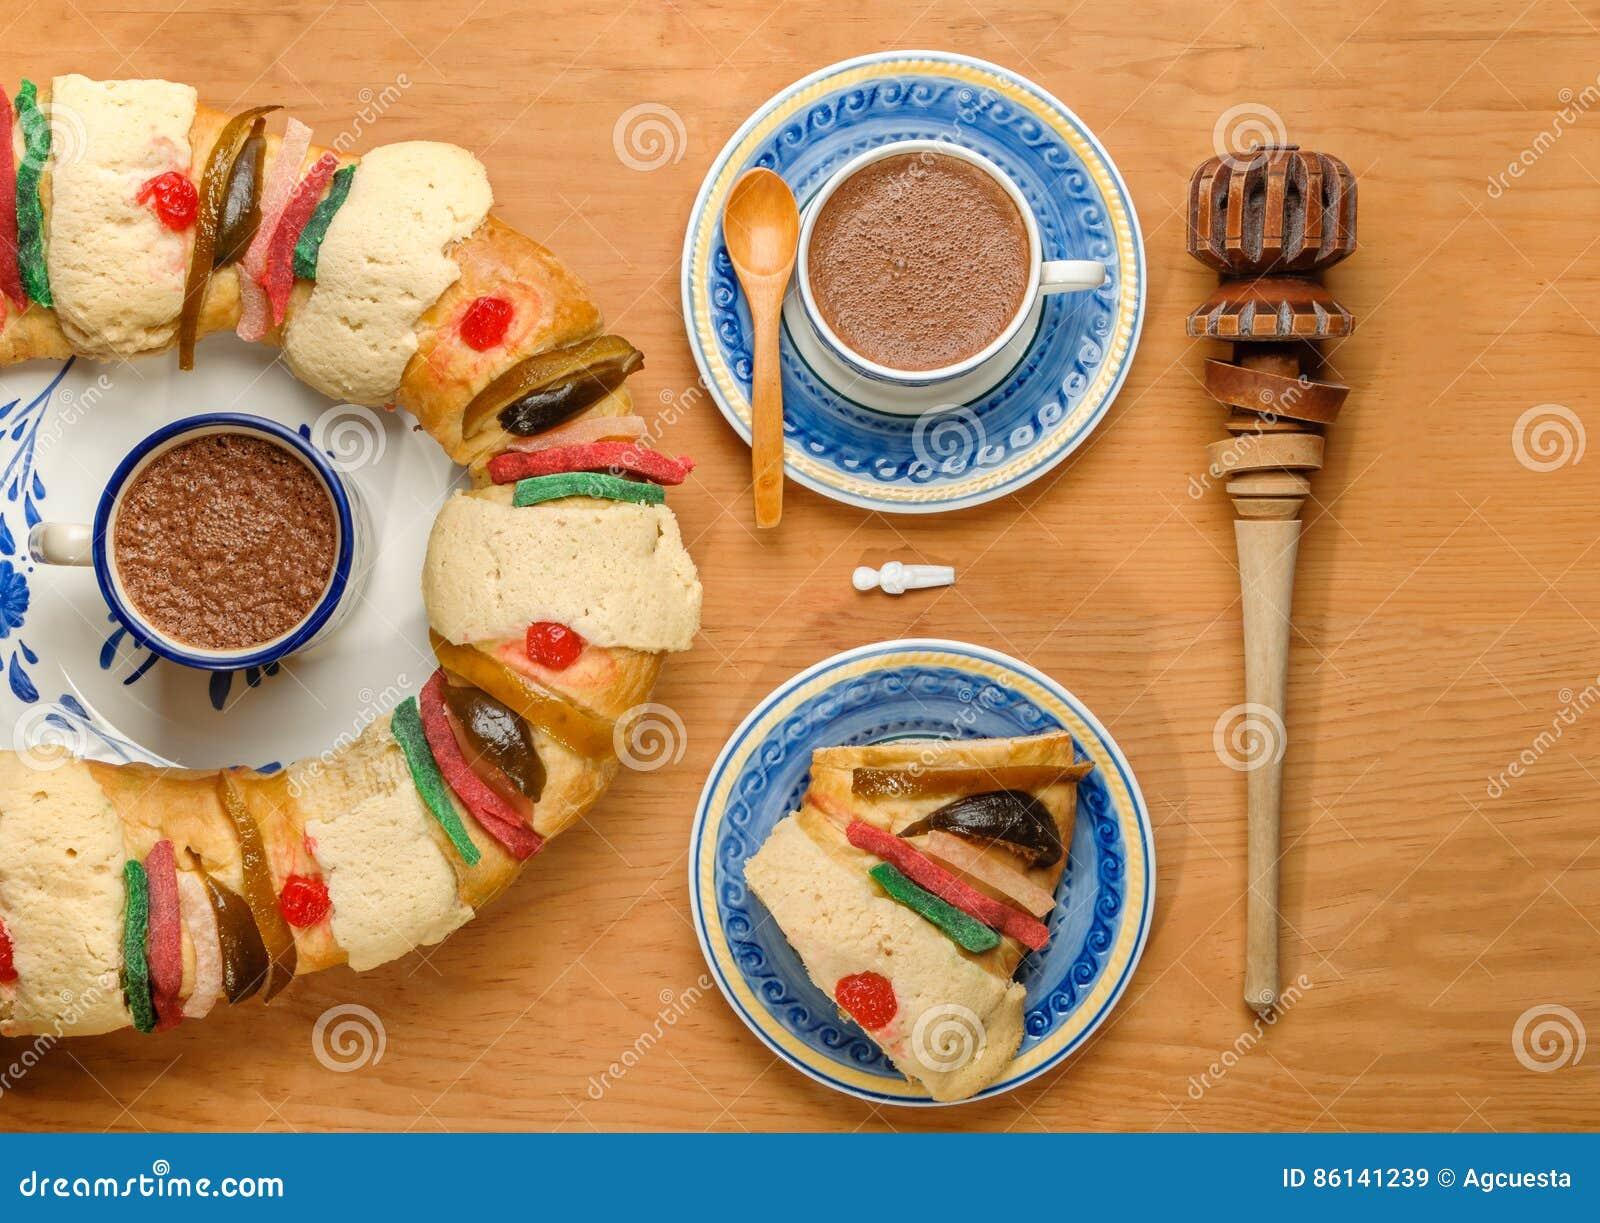 Hot Chocolate with Epiphany cake, Kings cake, Rosca de reyes or Roscon de reyes